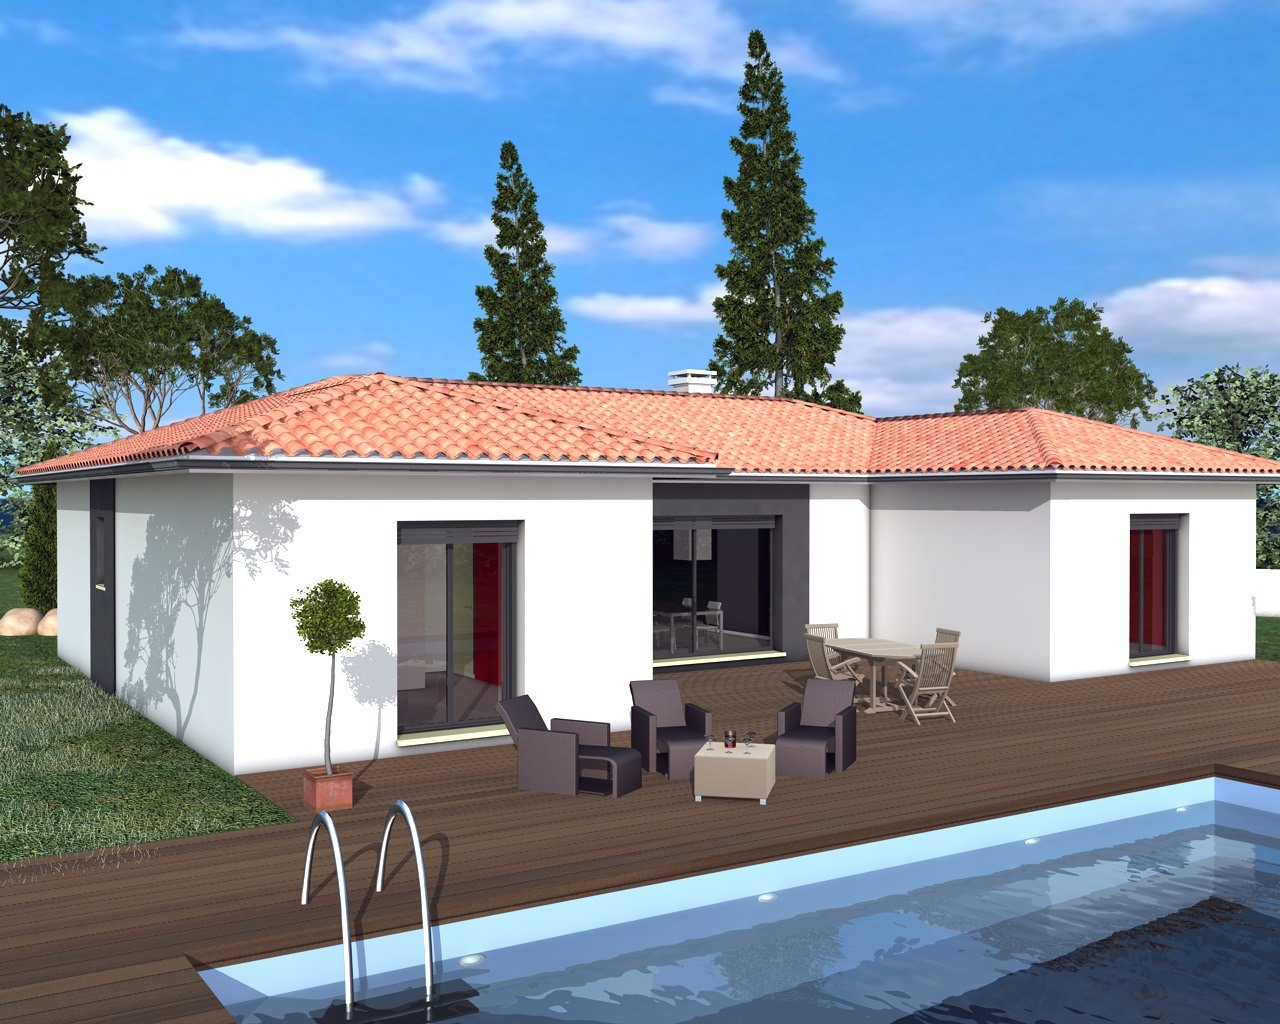 inspiration en u avec garage toit plat - Maison Moderne Avectoiture